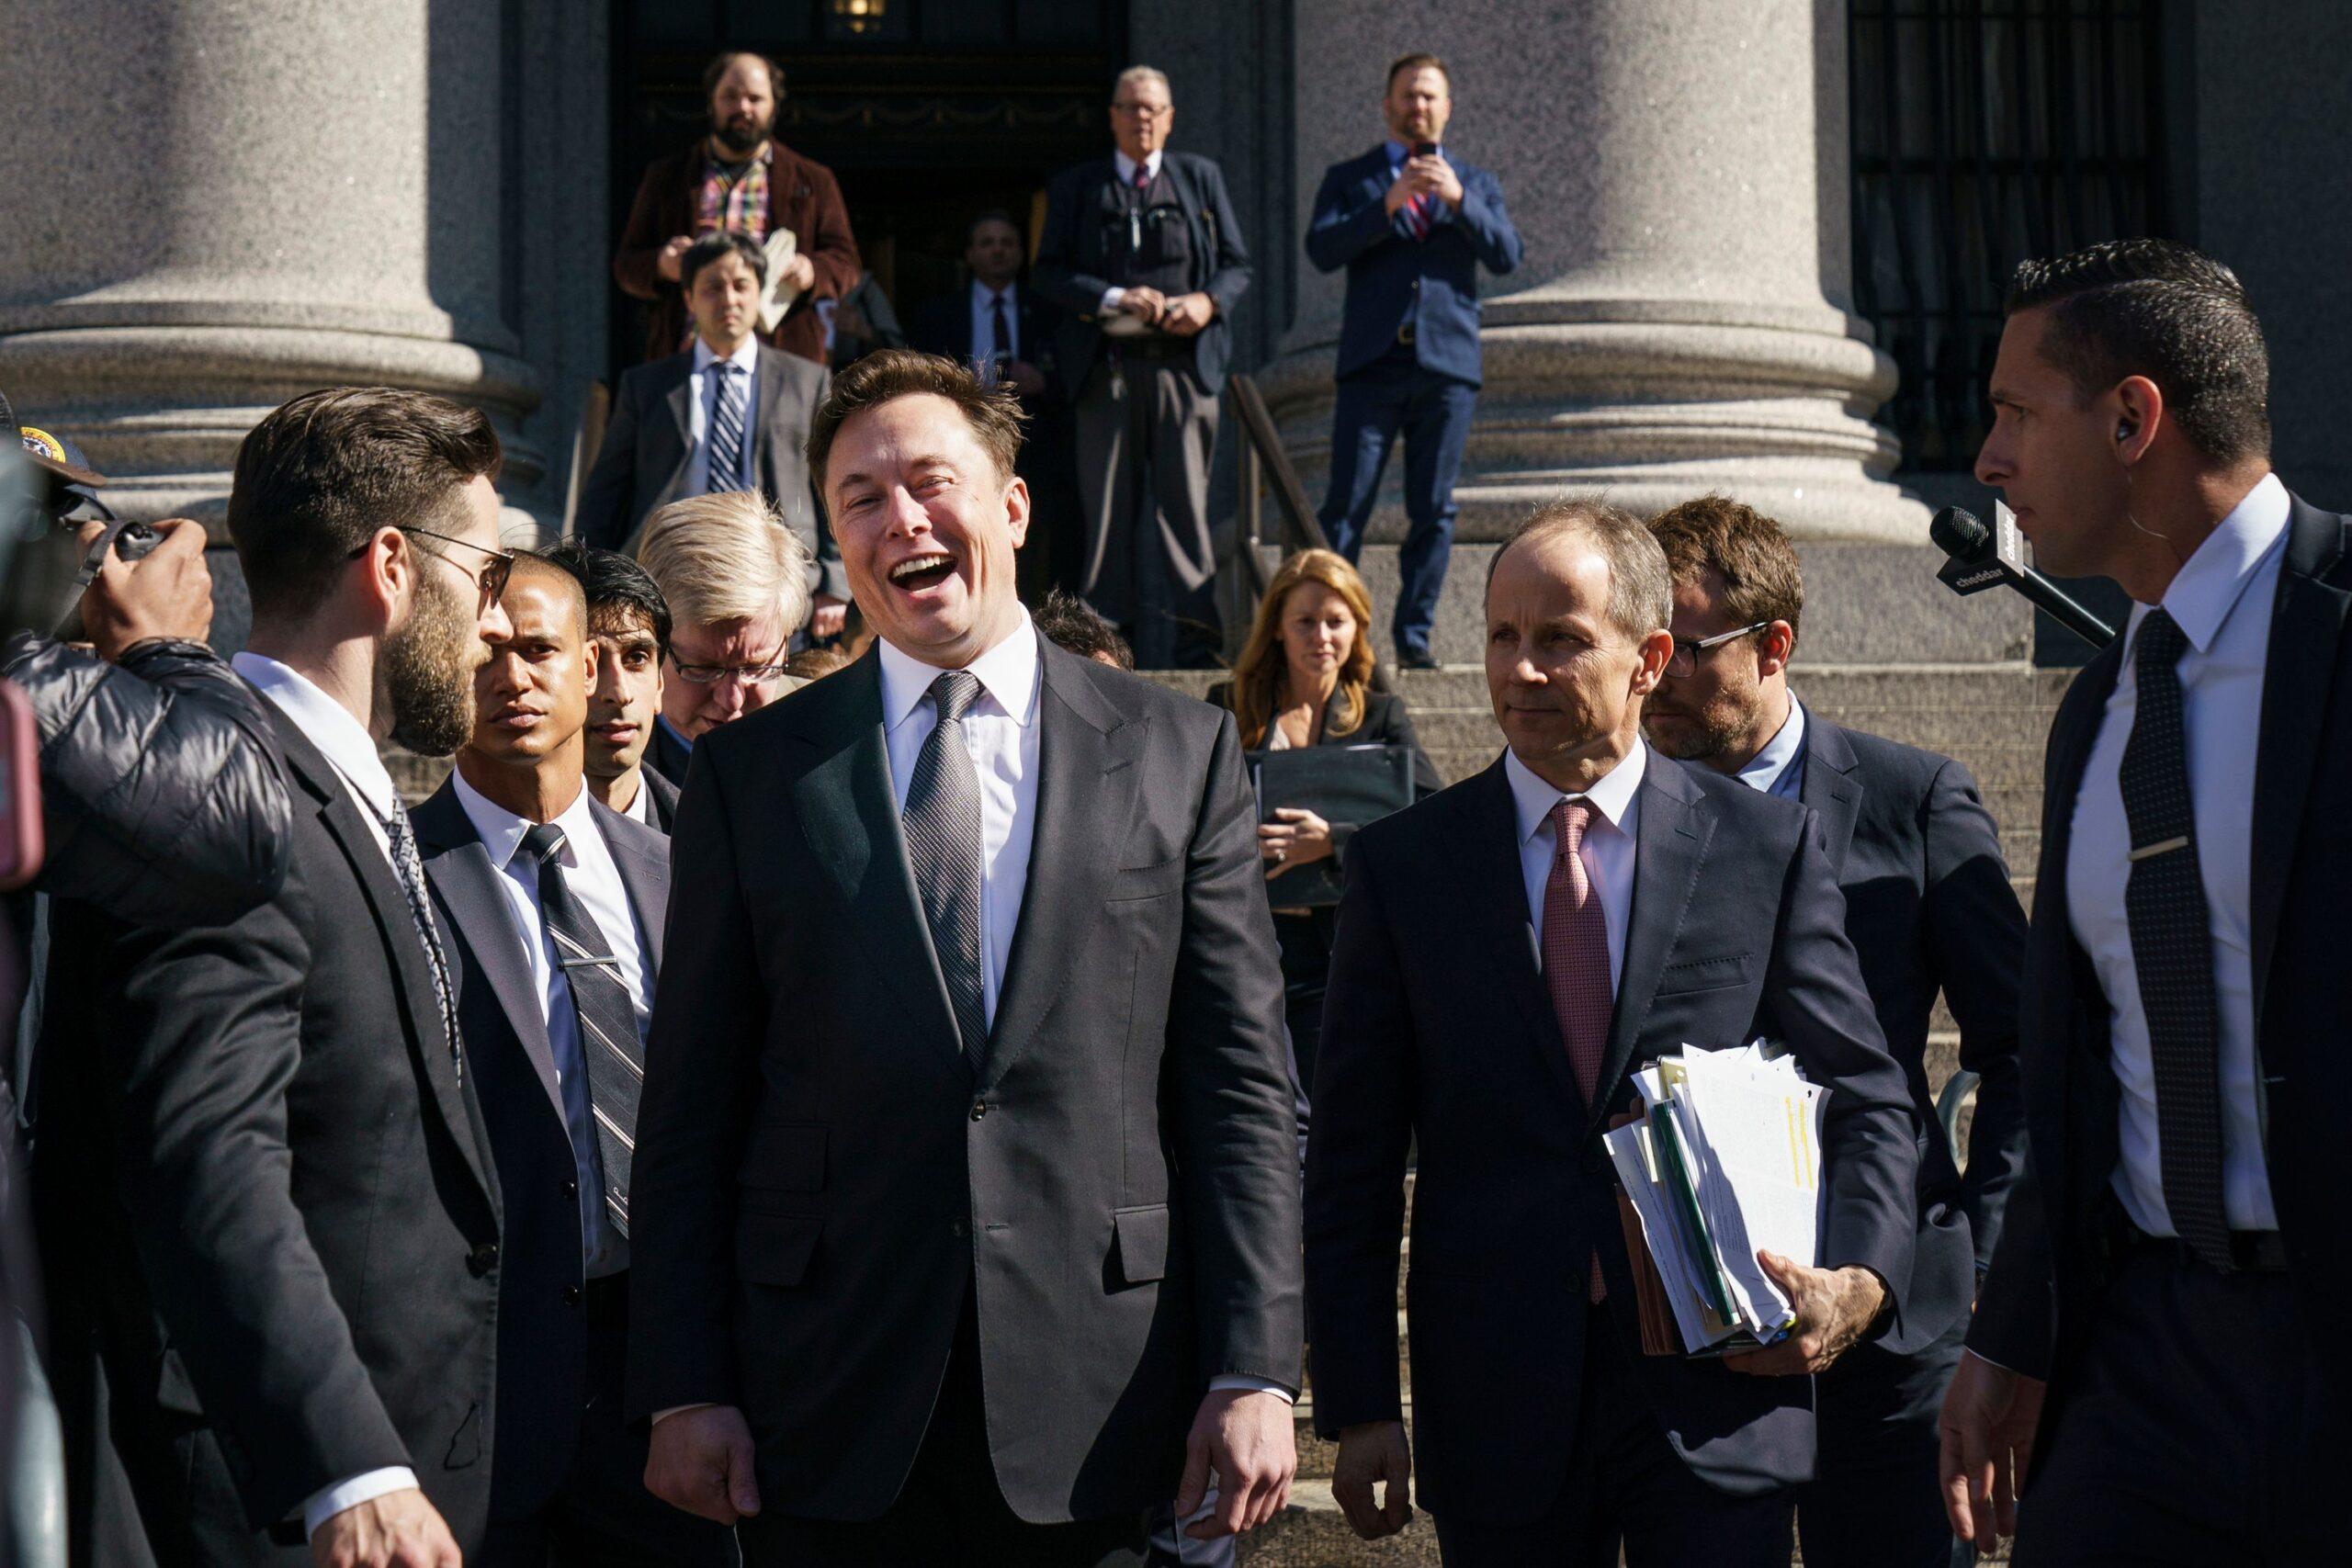 Elon Musk acusado de manipular mercado de criptomoedas